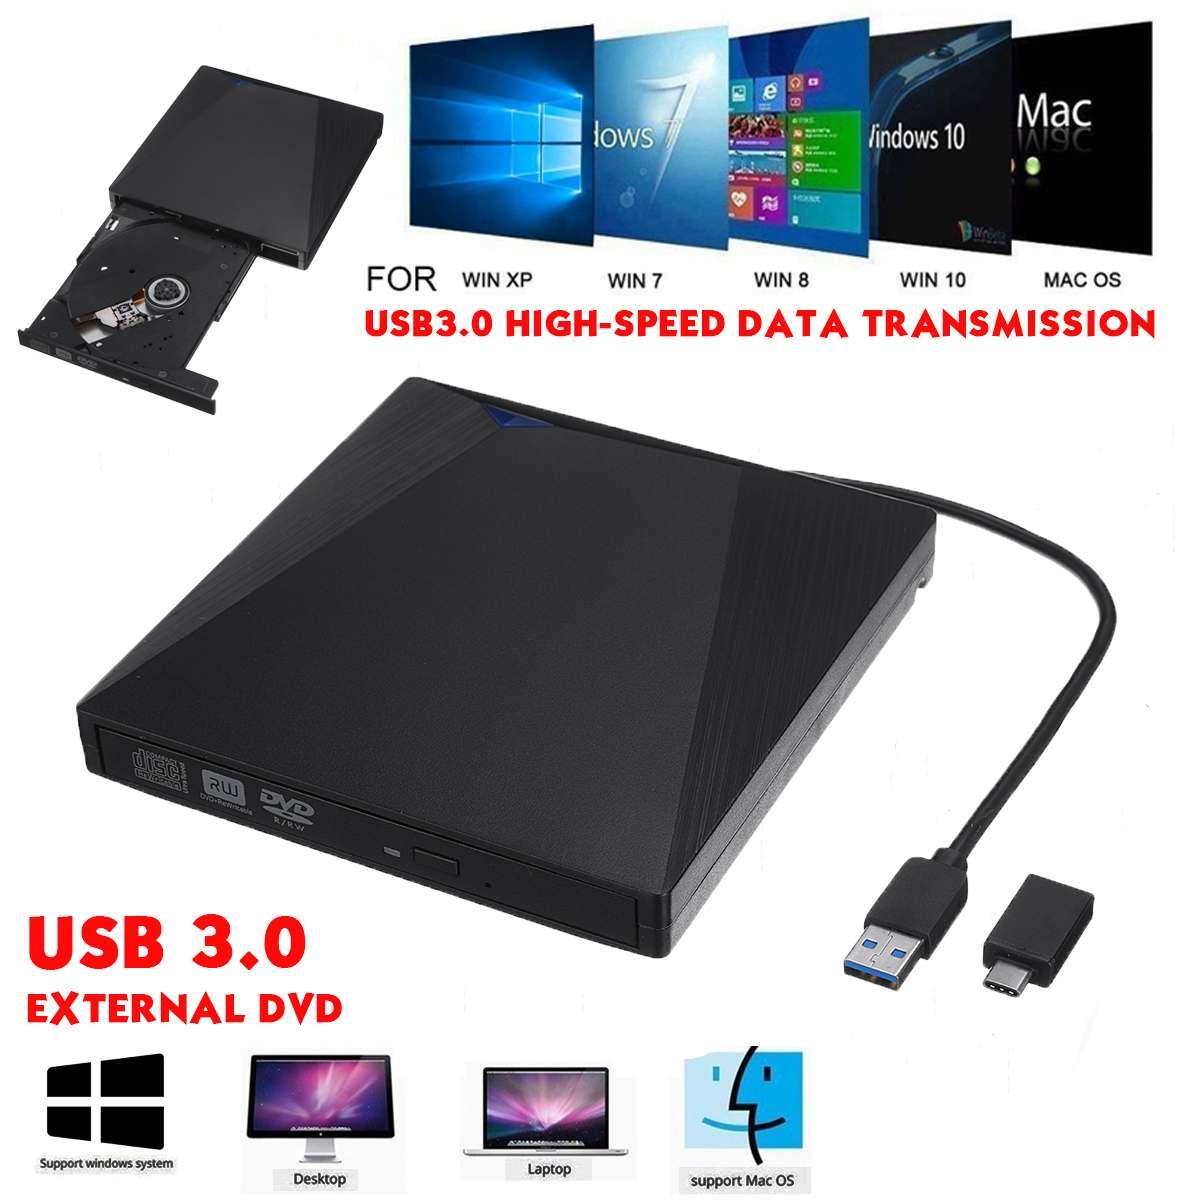 External Optical Drive USB3.0 DVD Burner RW CD Writer Slim Optical Drive Burner Reader Player Tray Type Portable For PC Laptop